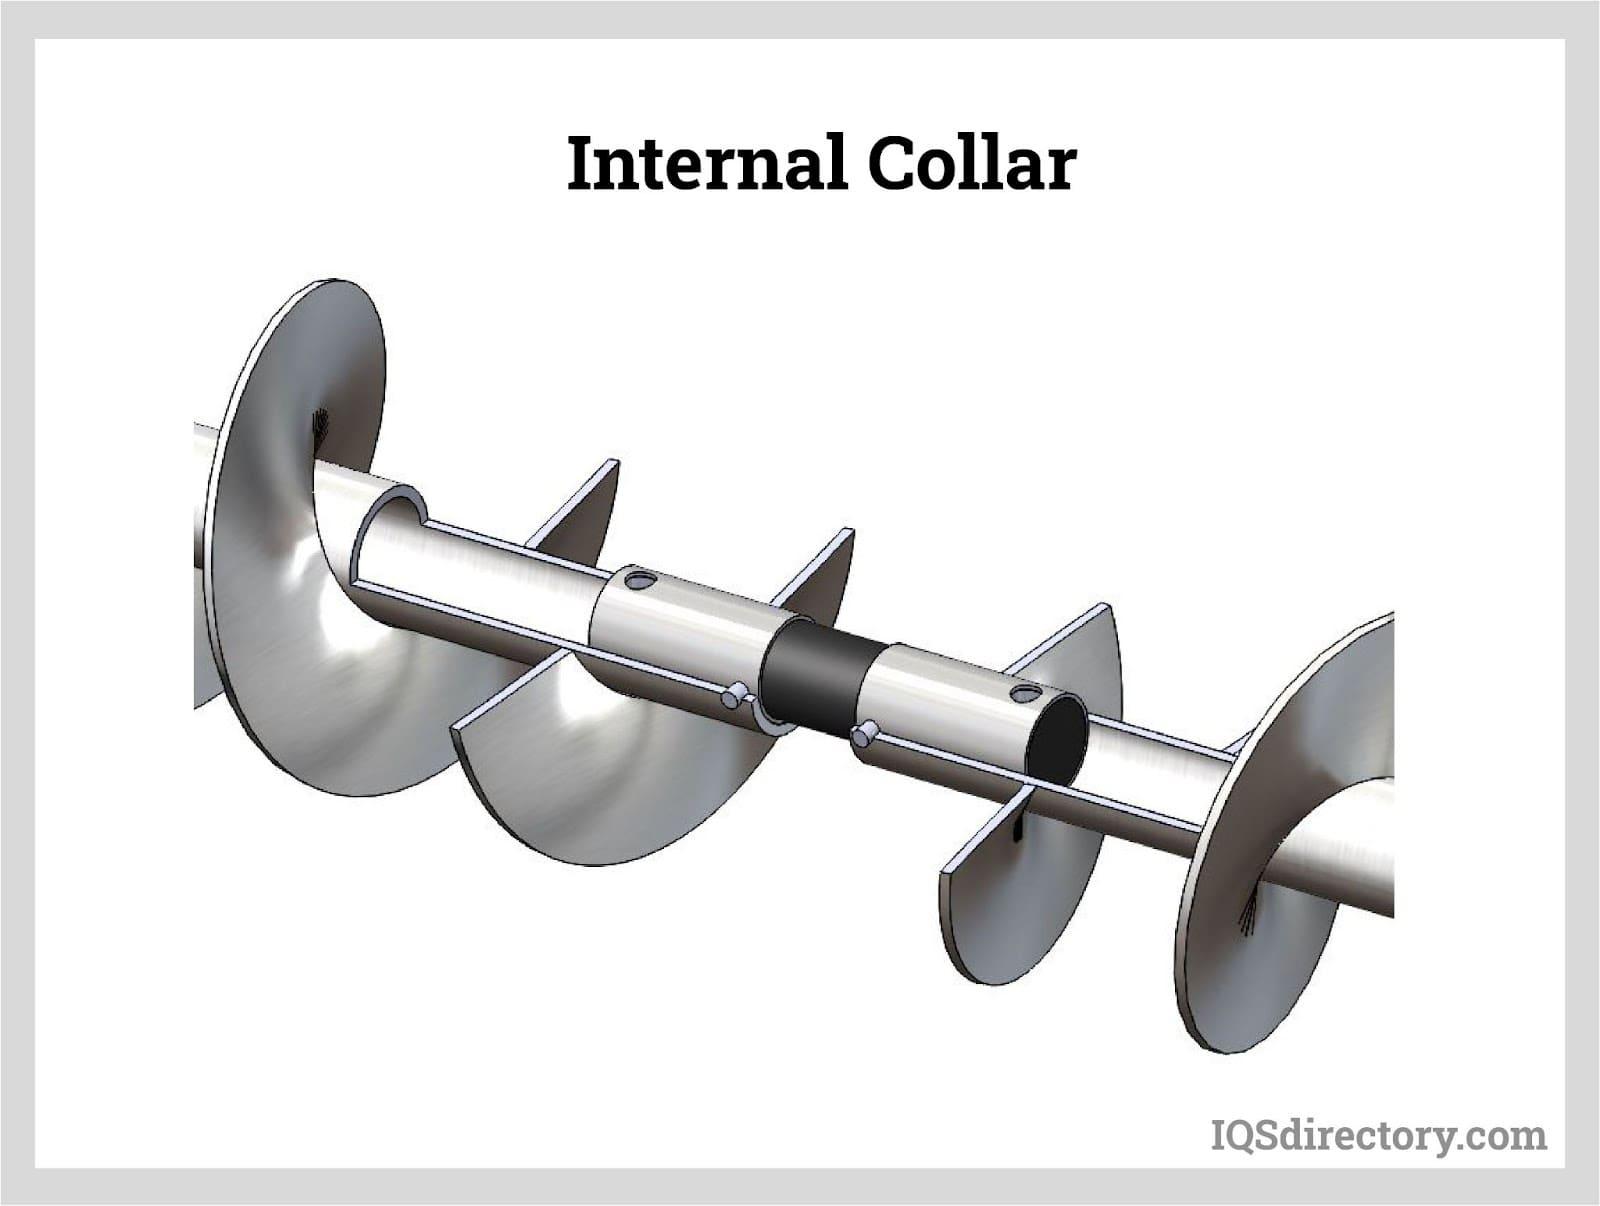 Internal Collar